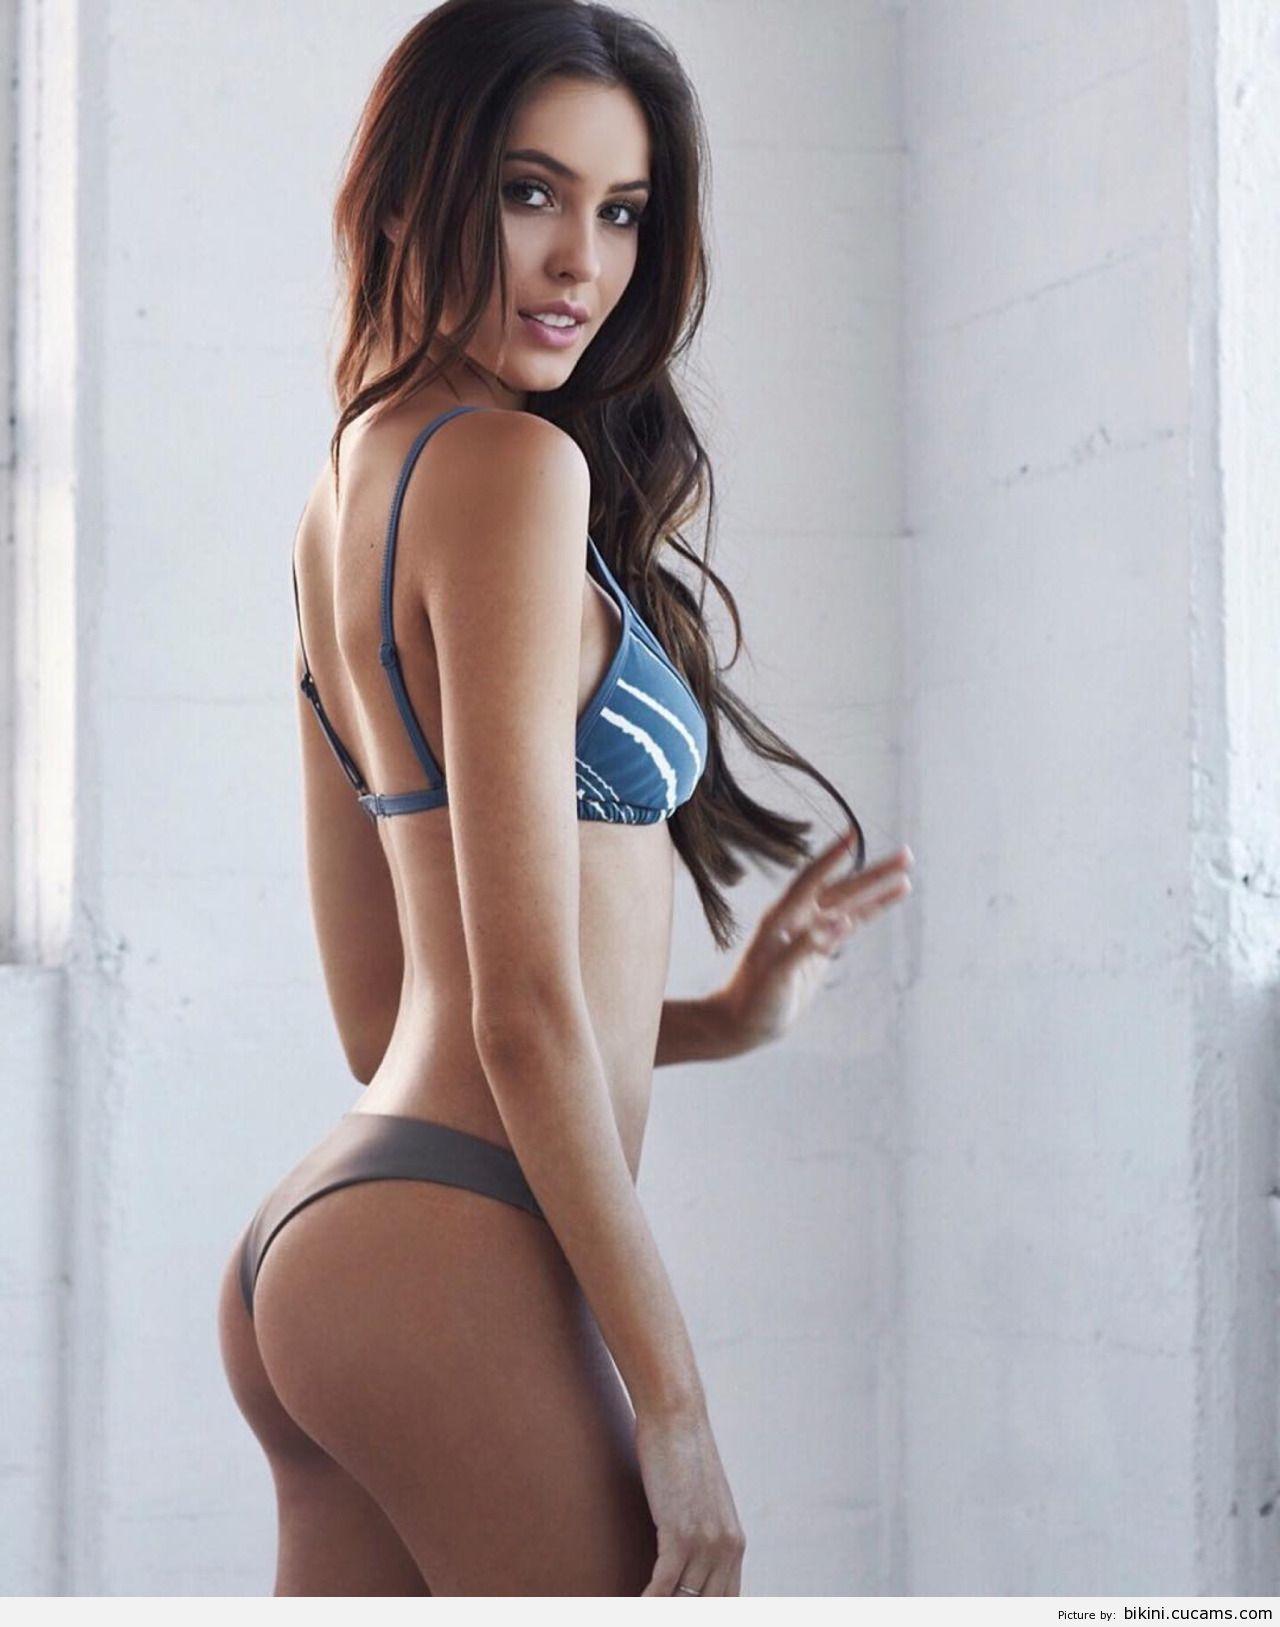 Bikini Buttplug Busty by bikini.cucams.com